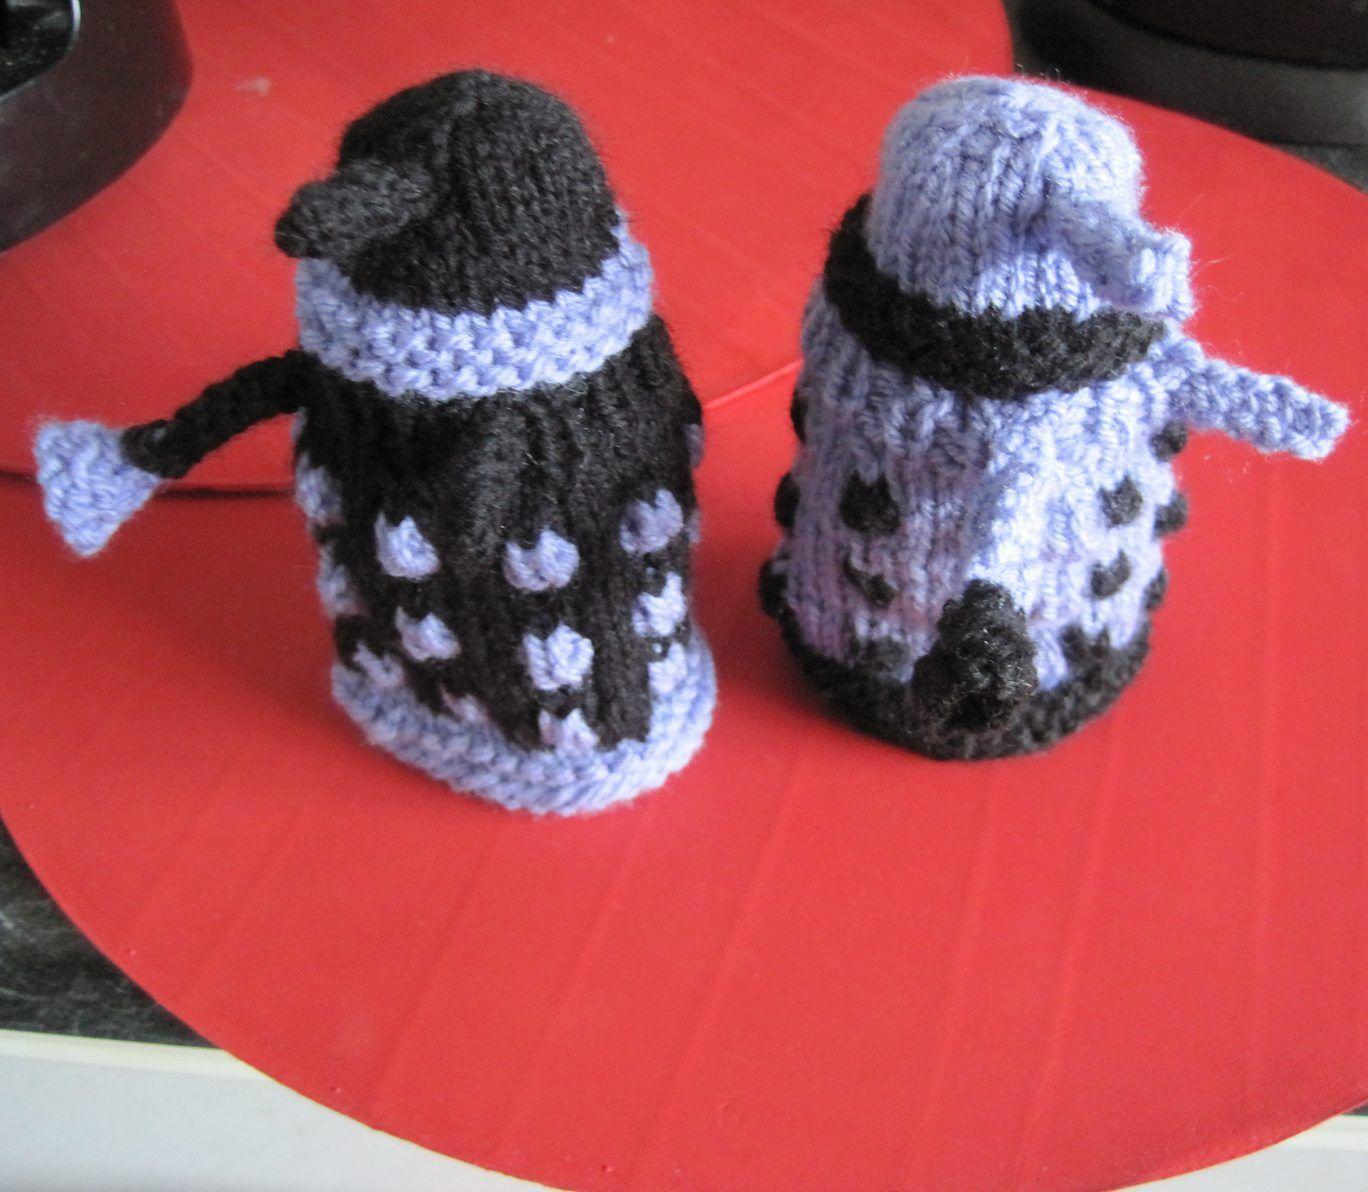 Teeny Toy Knitting Patterns | Knitting patterns, Teddy bear patterns ...